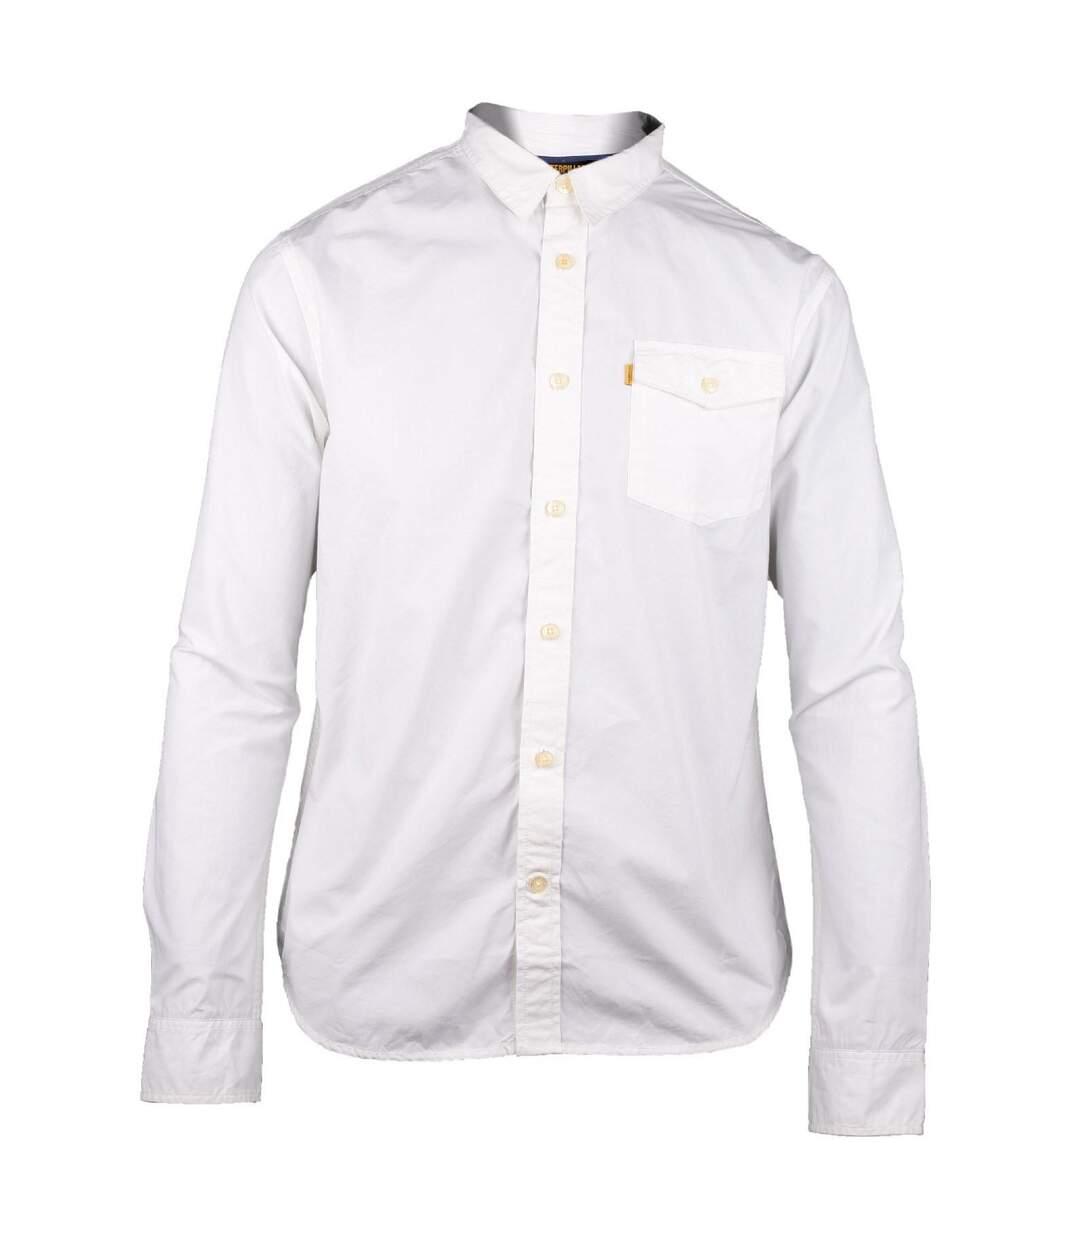 Caterpillar Exchange Mens Long Sleeve Casual Cotton Shirt (White) - UTFS3065